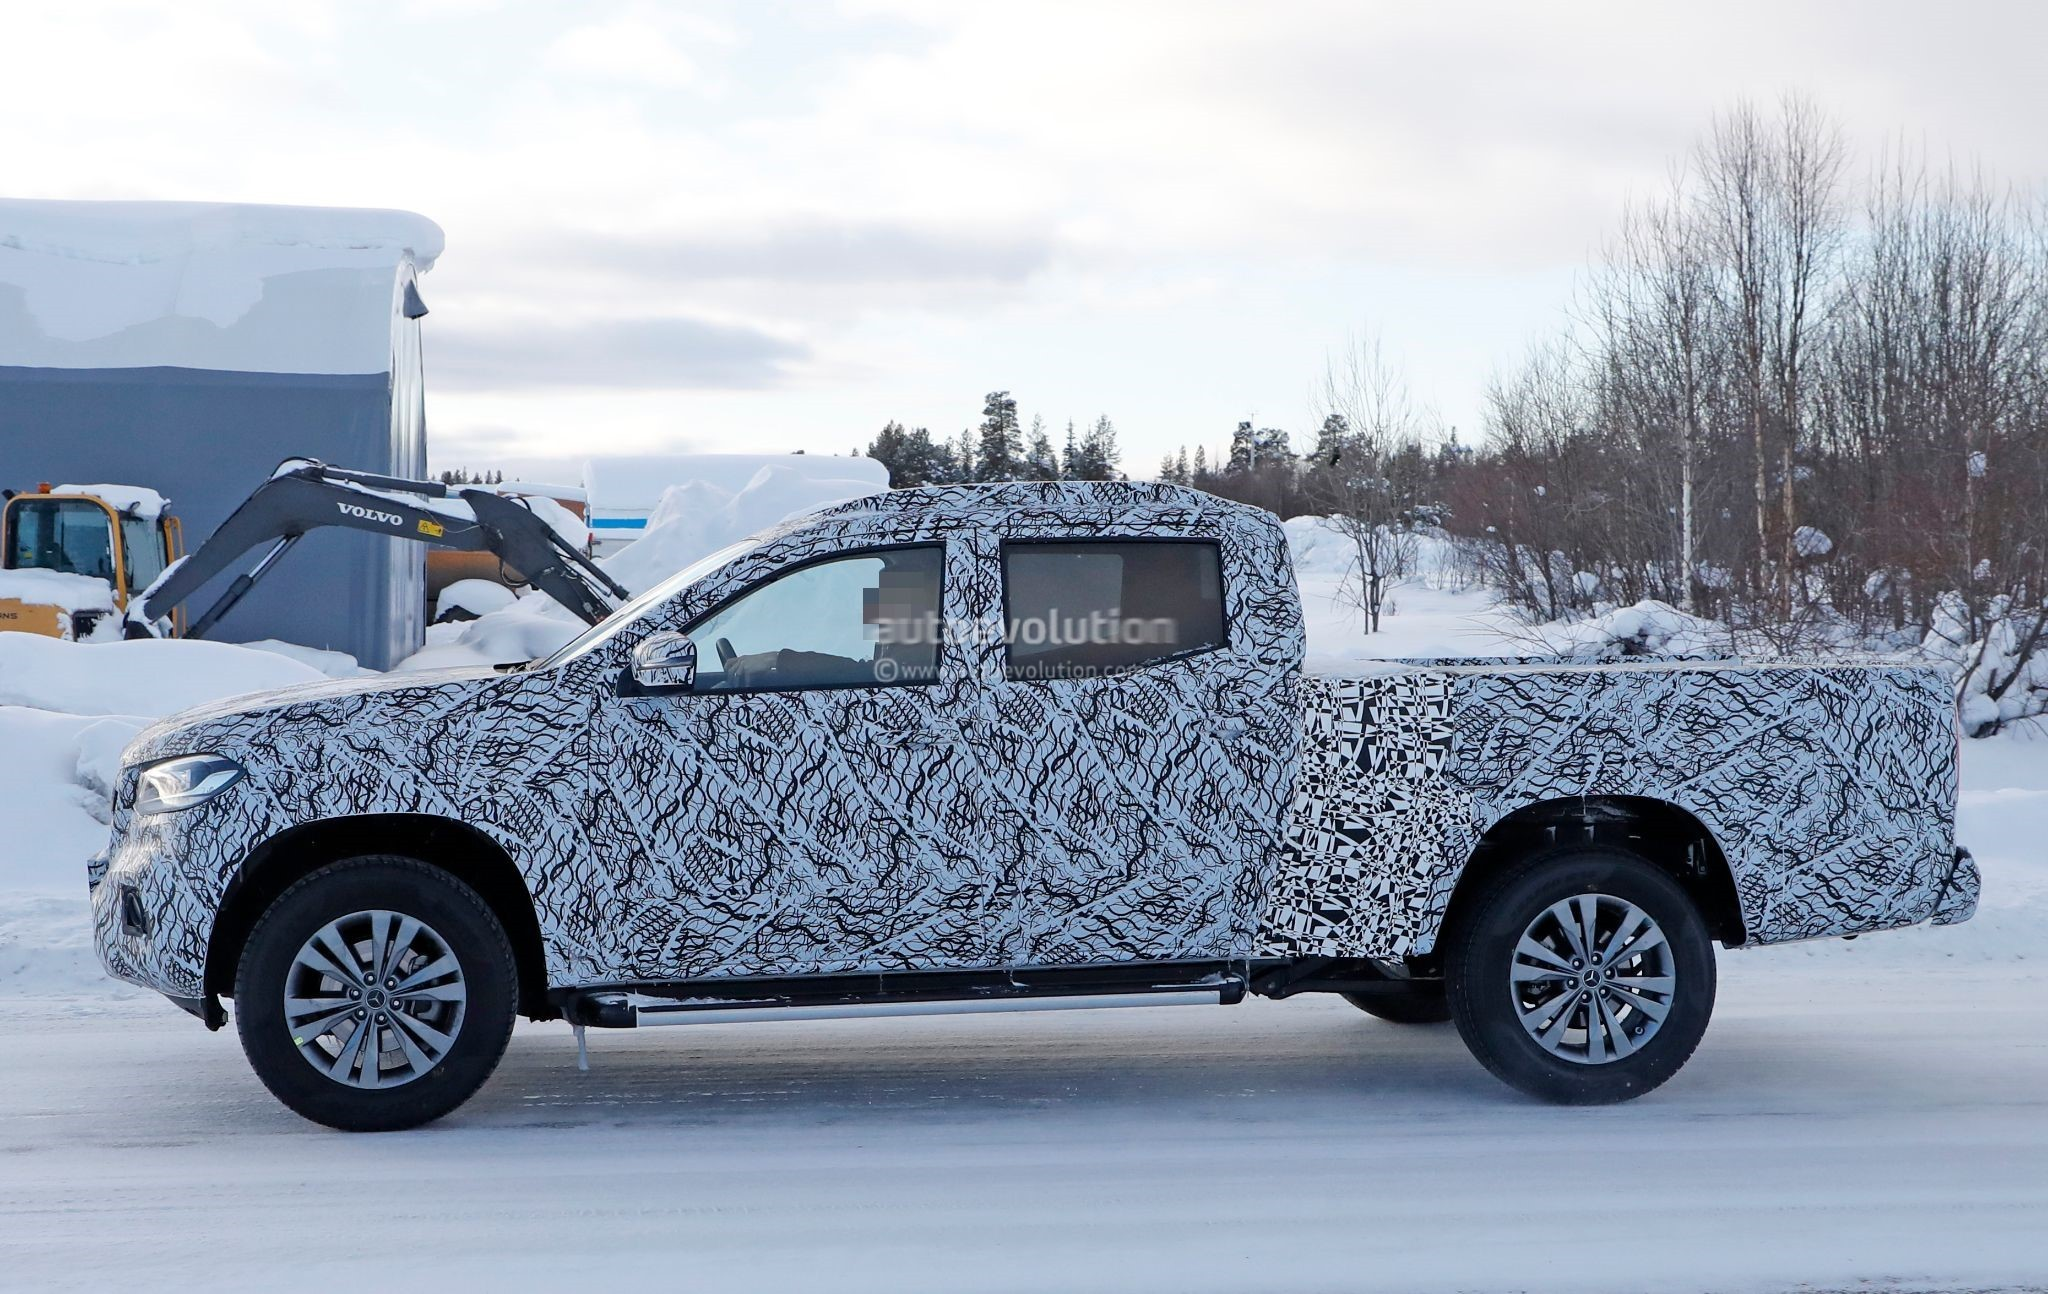 Spyshots: 2019 Mercedes-Benz X-Class Caught Sporting Longer Bed ...